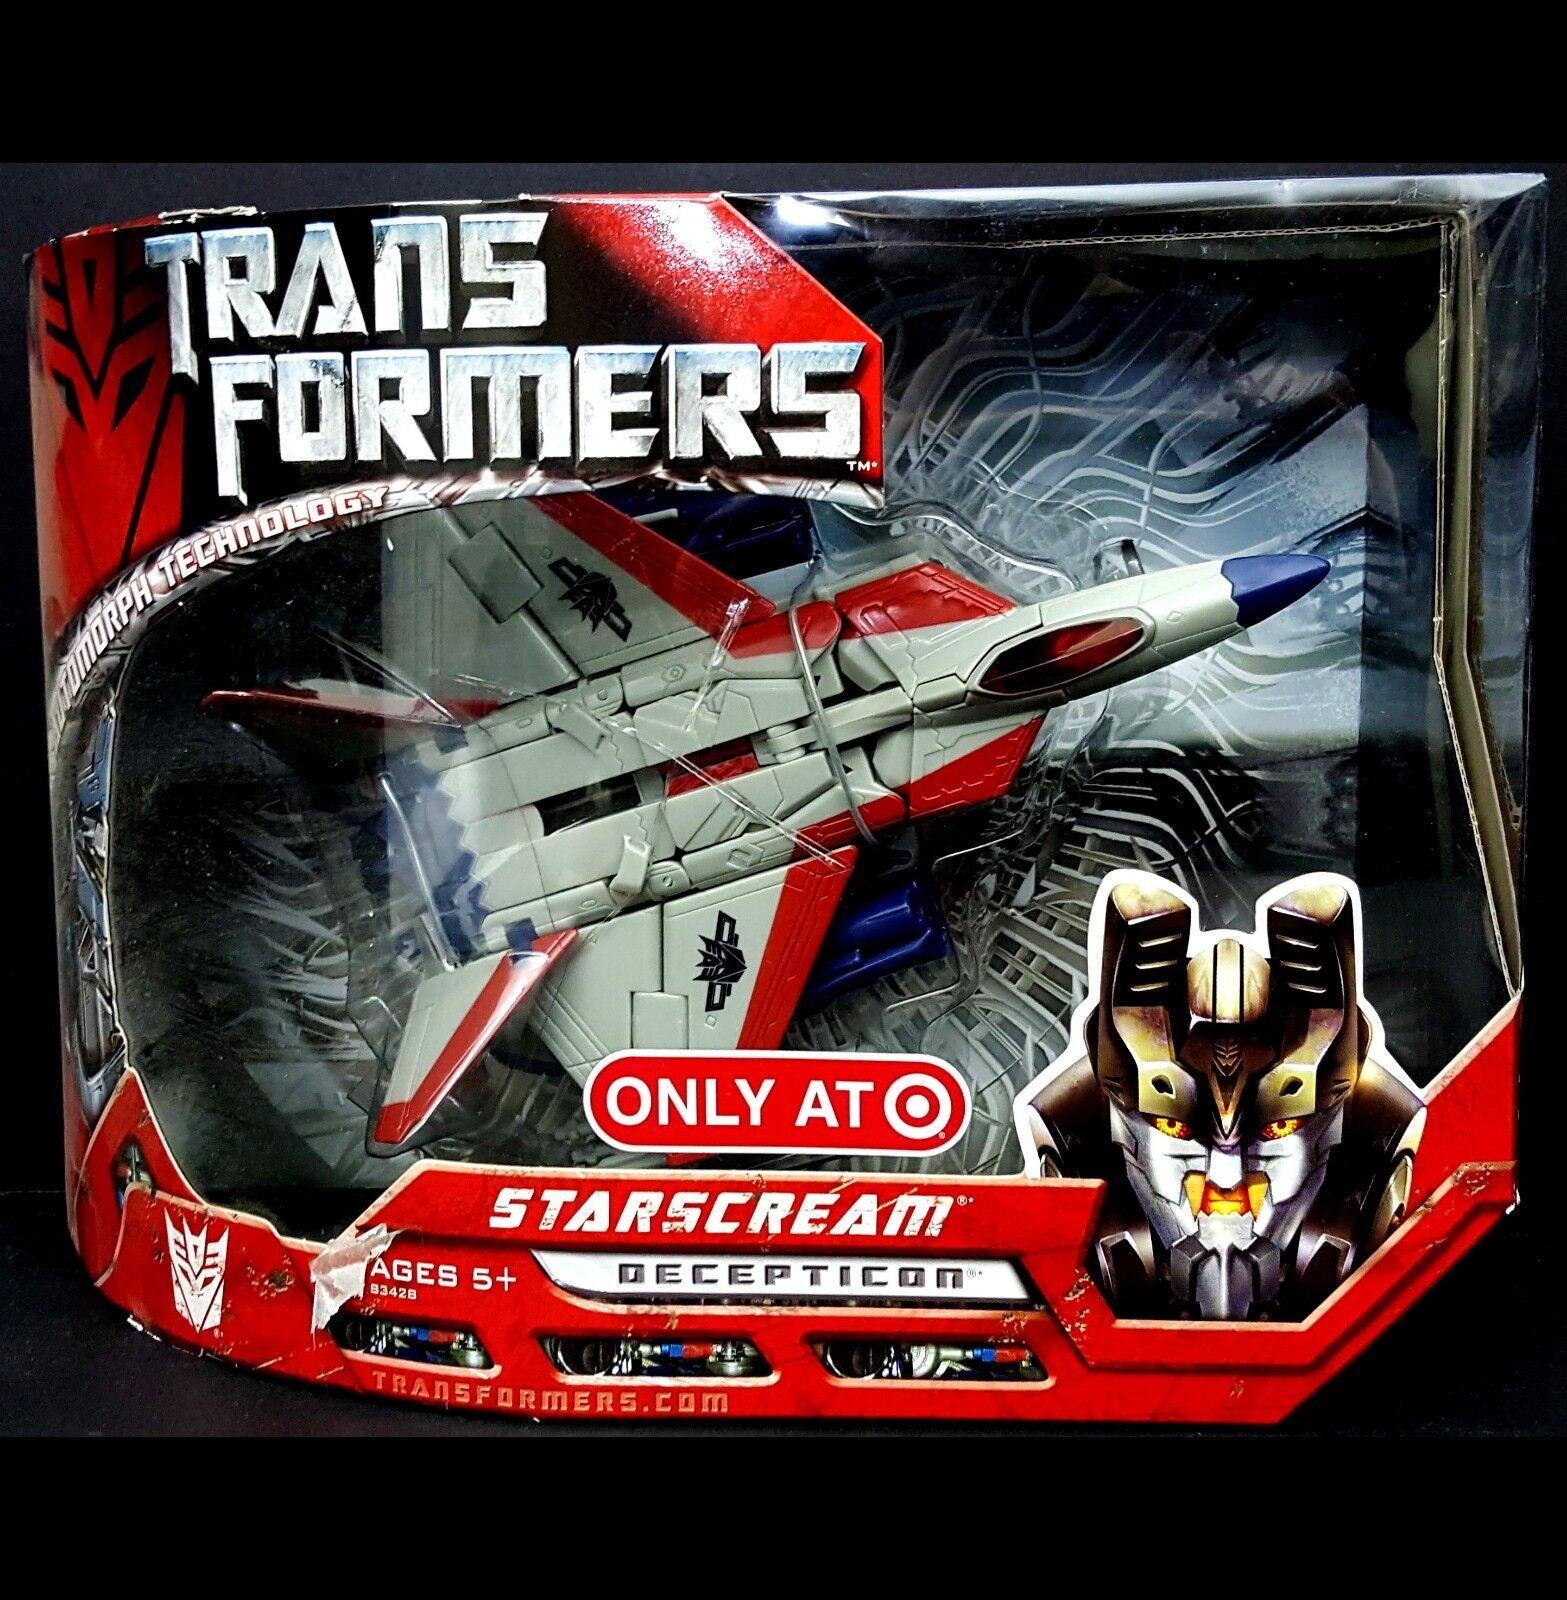 NEW Transformers G1 Voyager Starscream Decepticon 83428 SEALED Target Exclu 2007